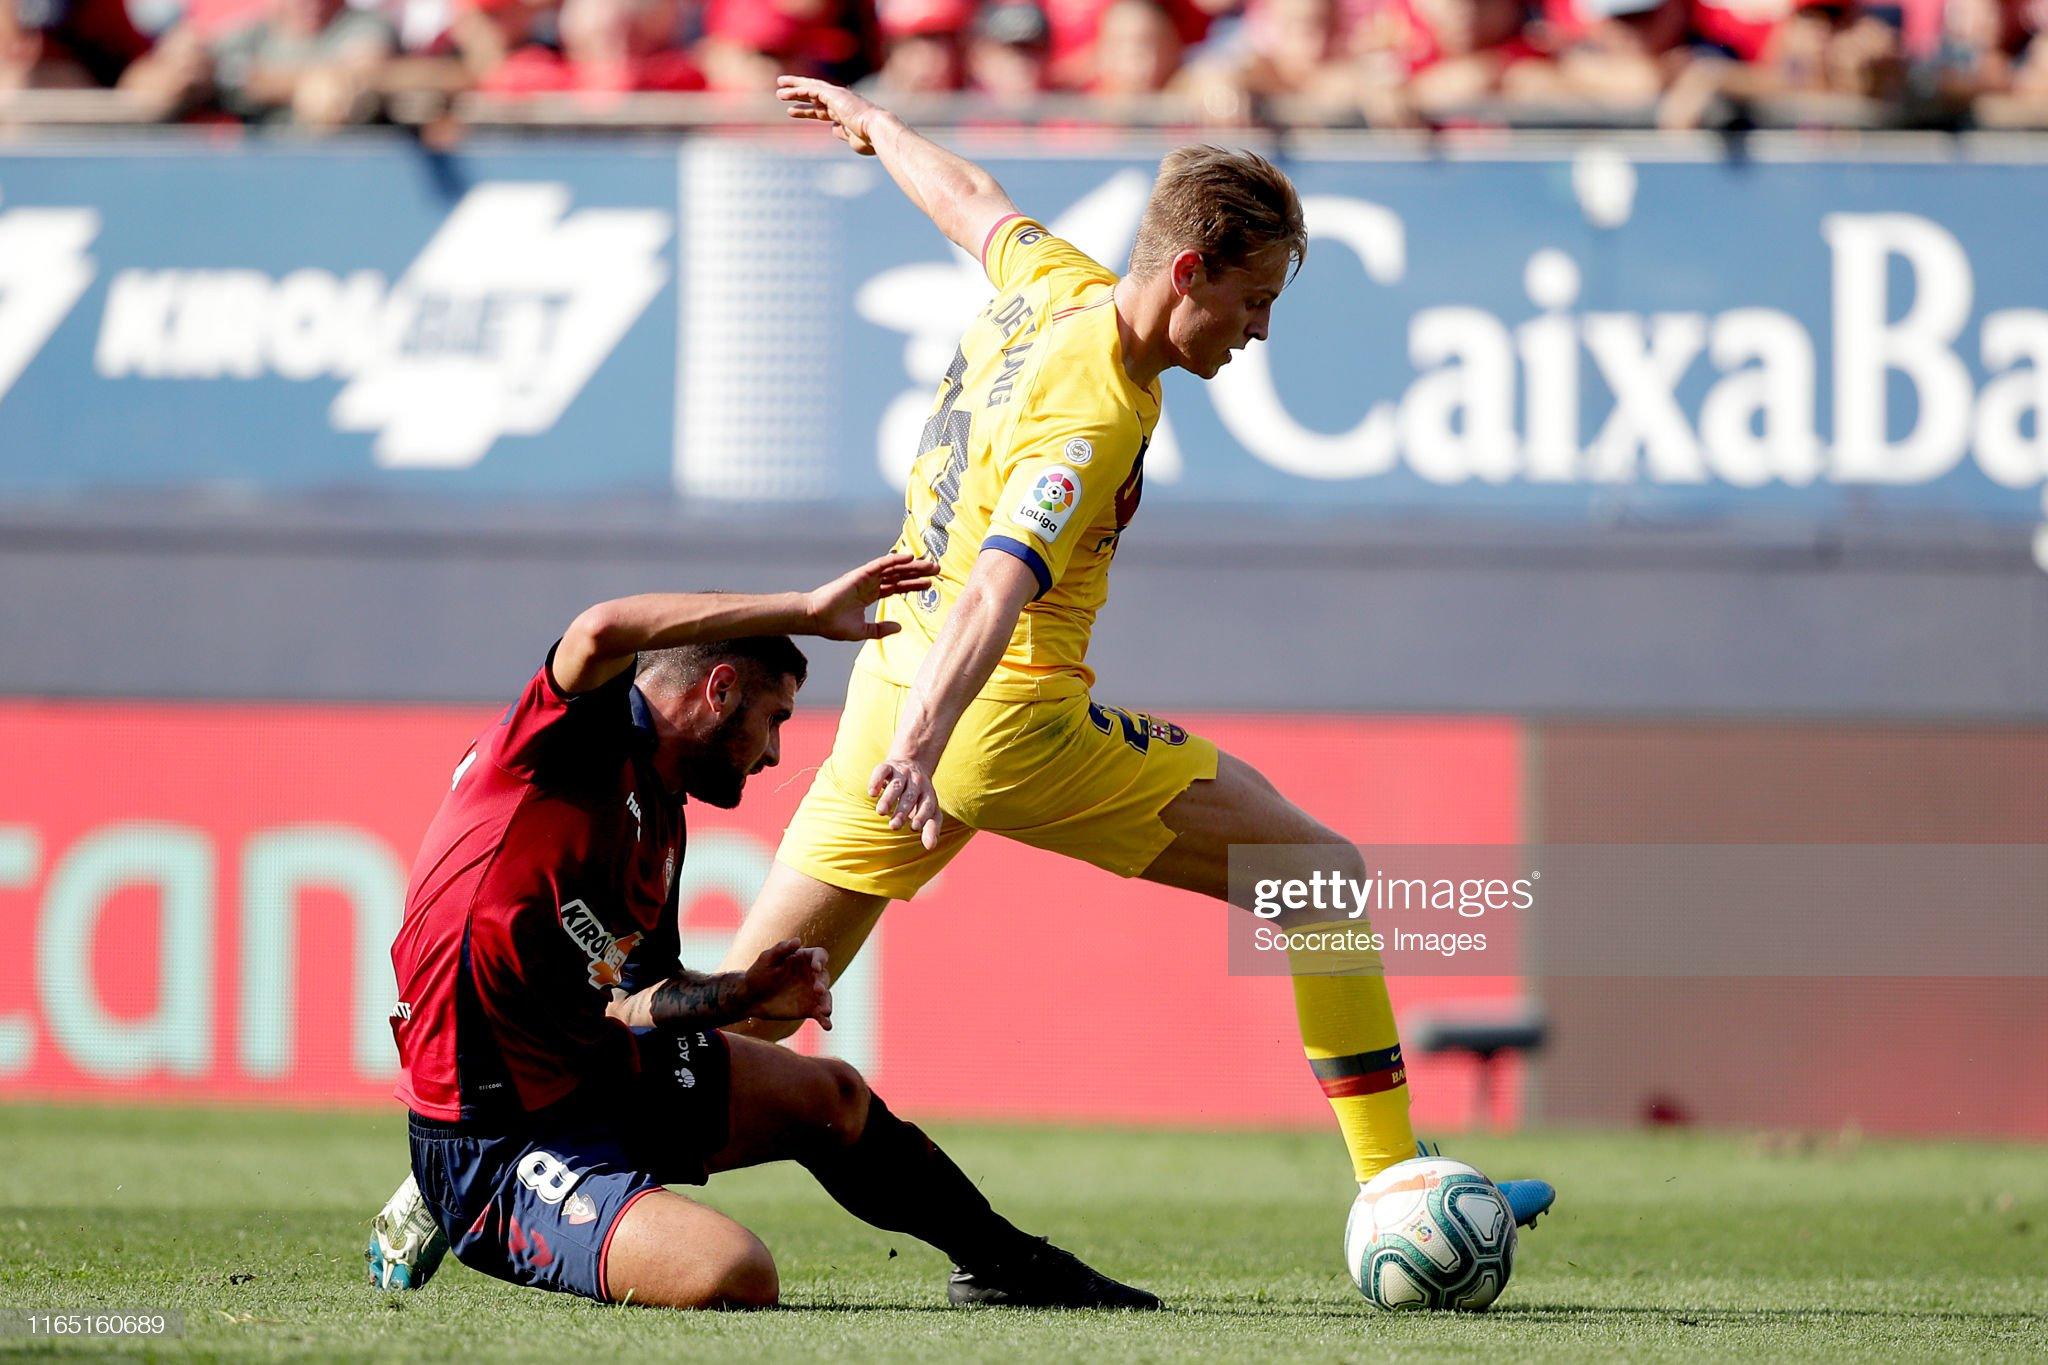 صور مباراة : أوساسونا - برشلونة 2-2 ( 31-08-2019 )  Frenkie-de-jong-of-fc-barcelona-during-the-la-liga-santander-match-picture-id1165160689?s=2048x2048